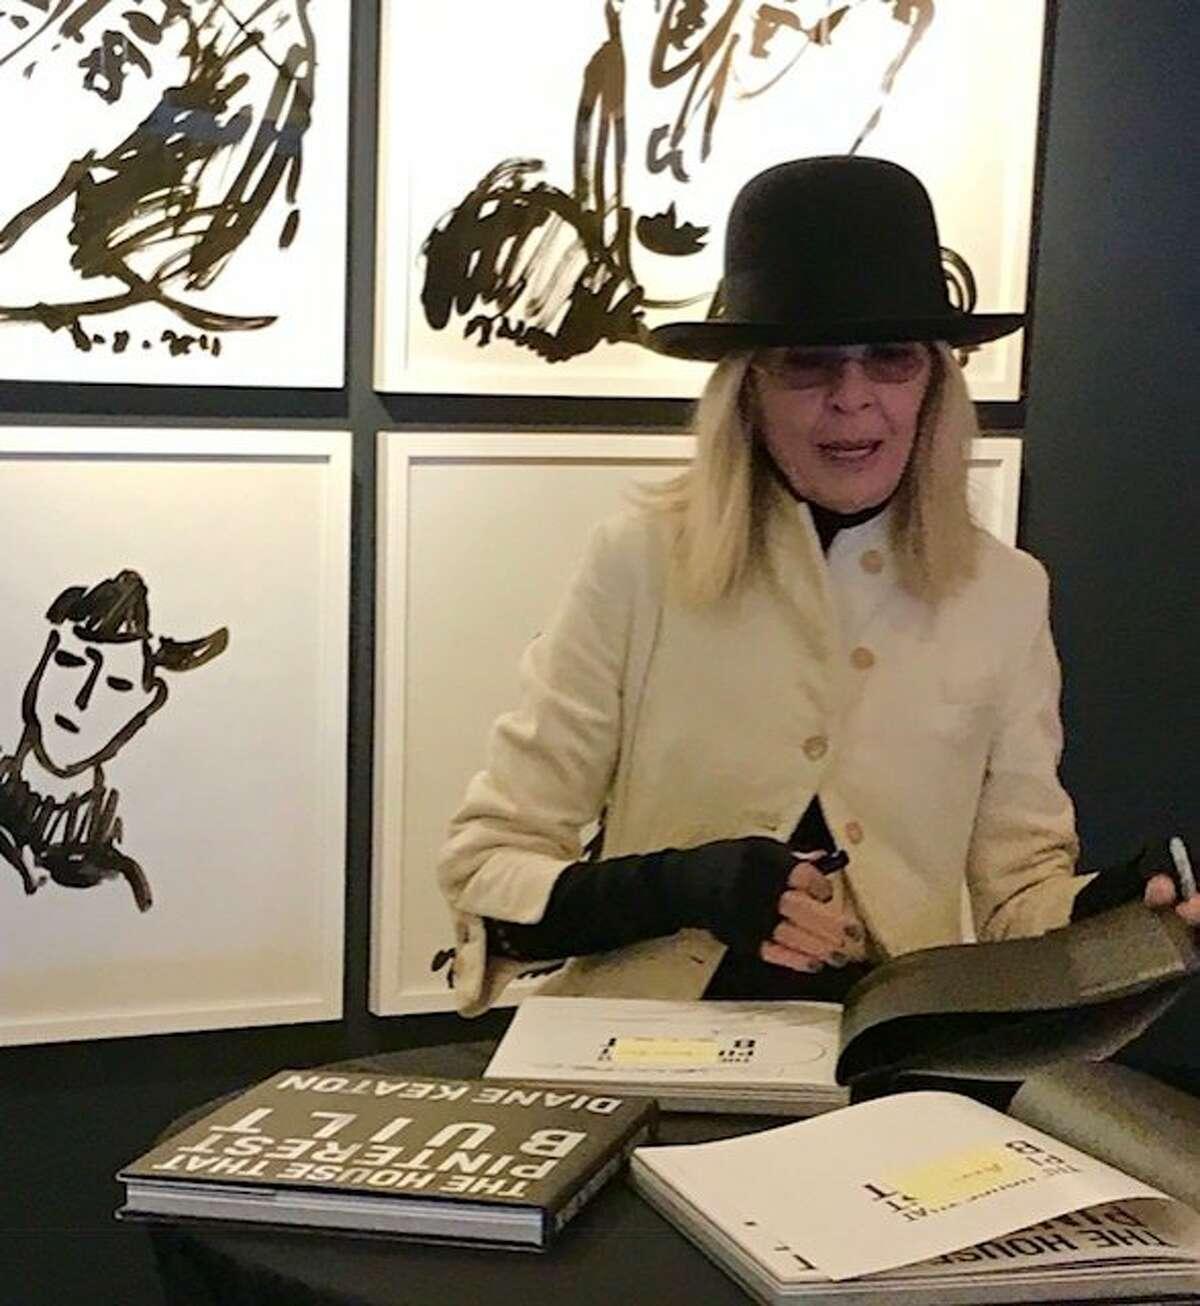 Diane Keaton at book signing at Hudson/Grace in San Francisco